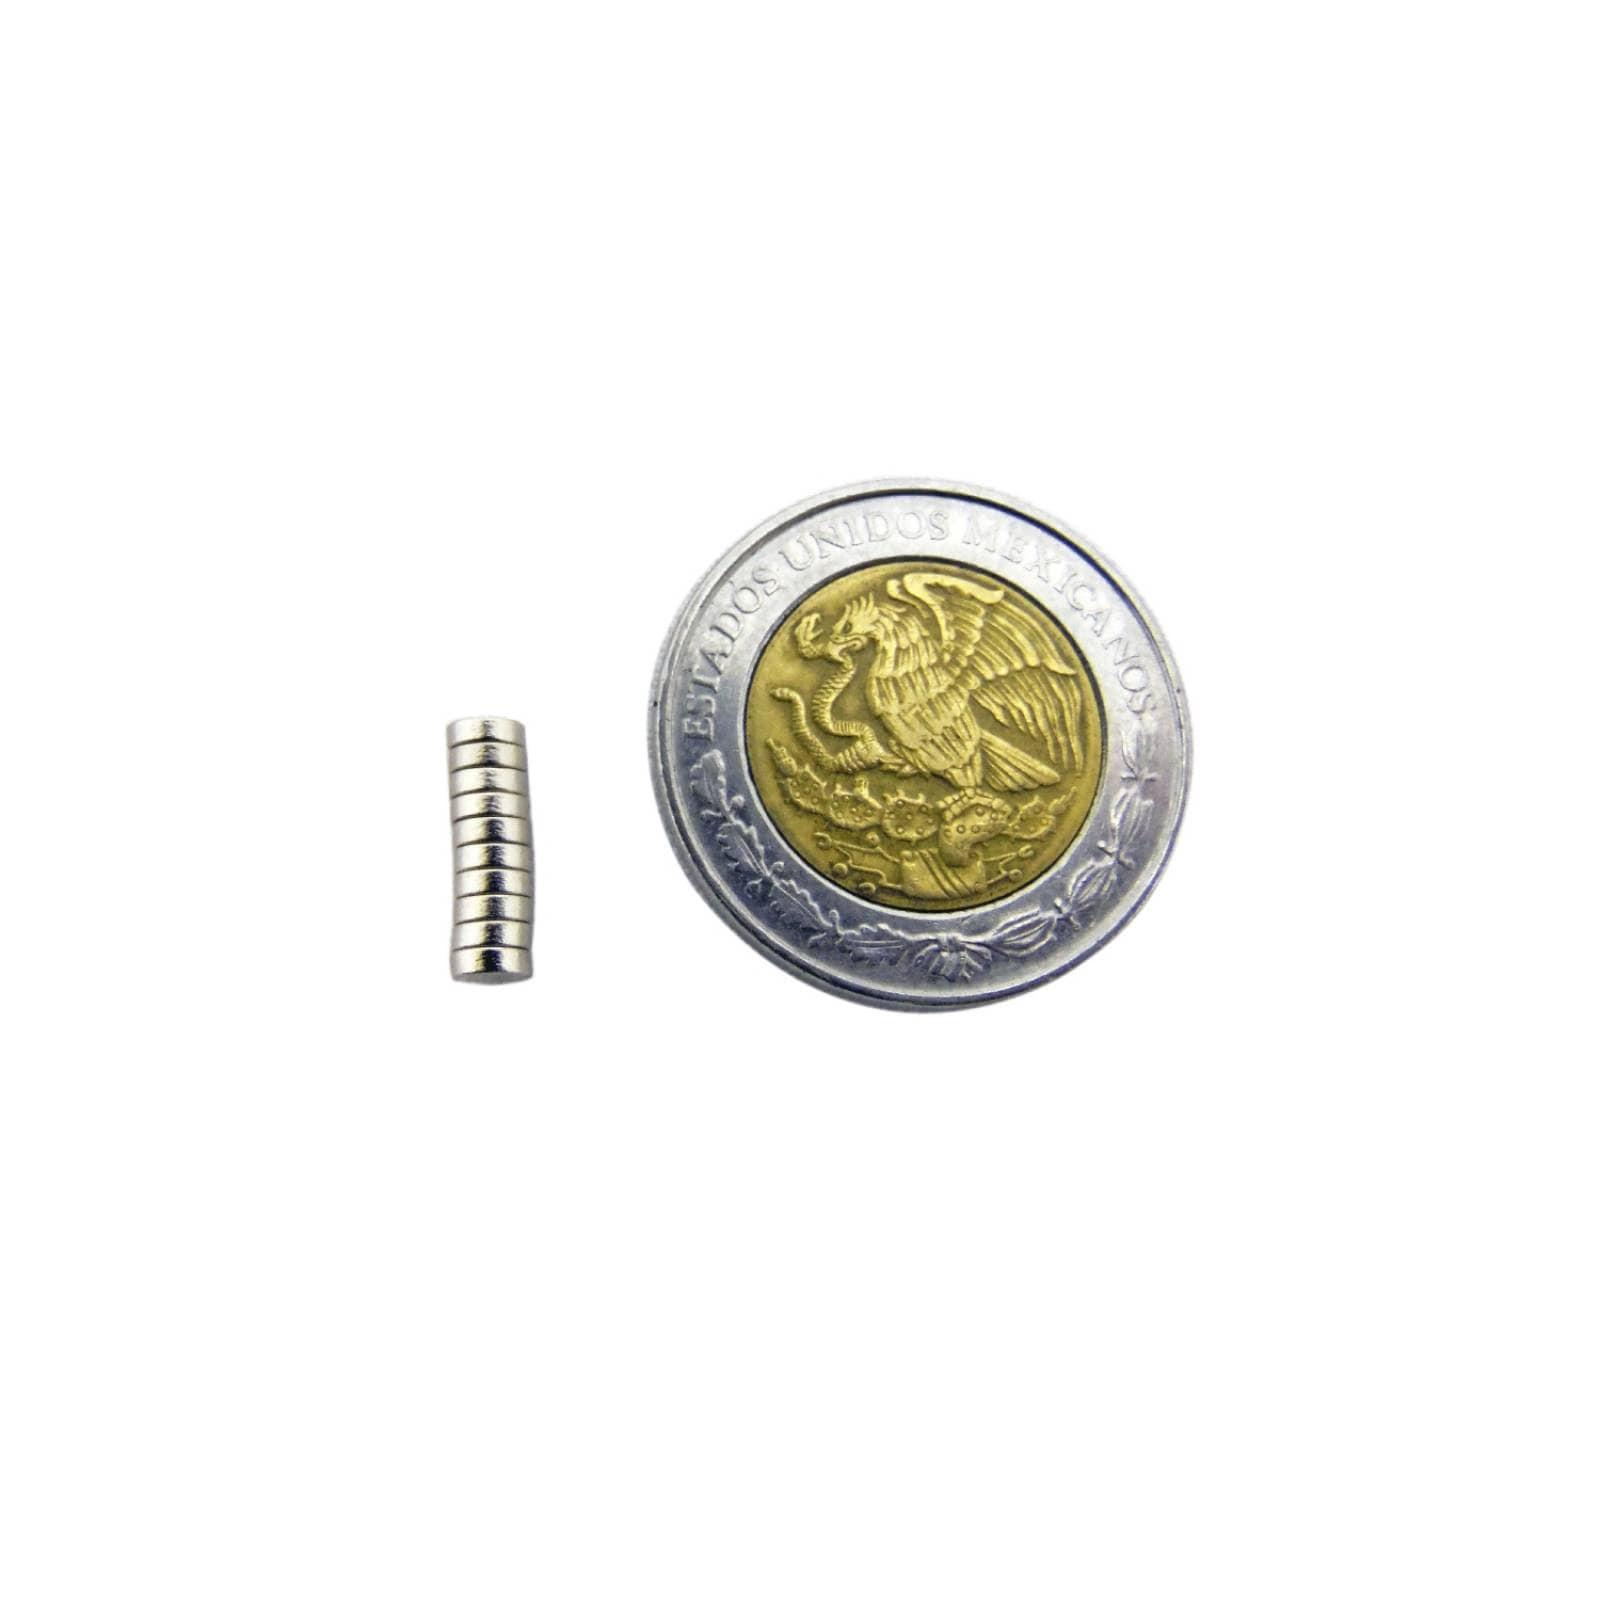 Iman Redondo Neodimio 3 X 1 mm con 1 Pieza OBI